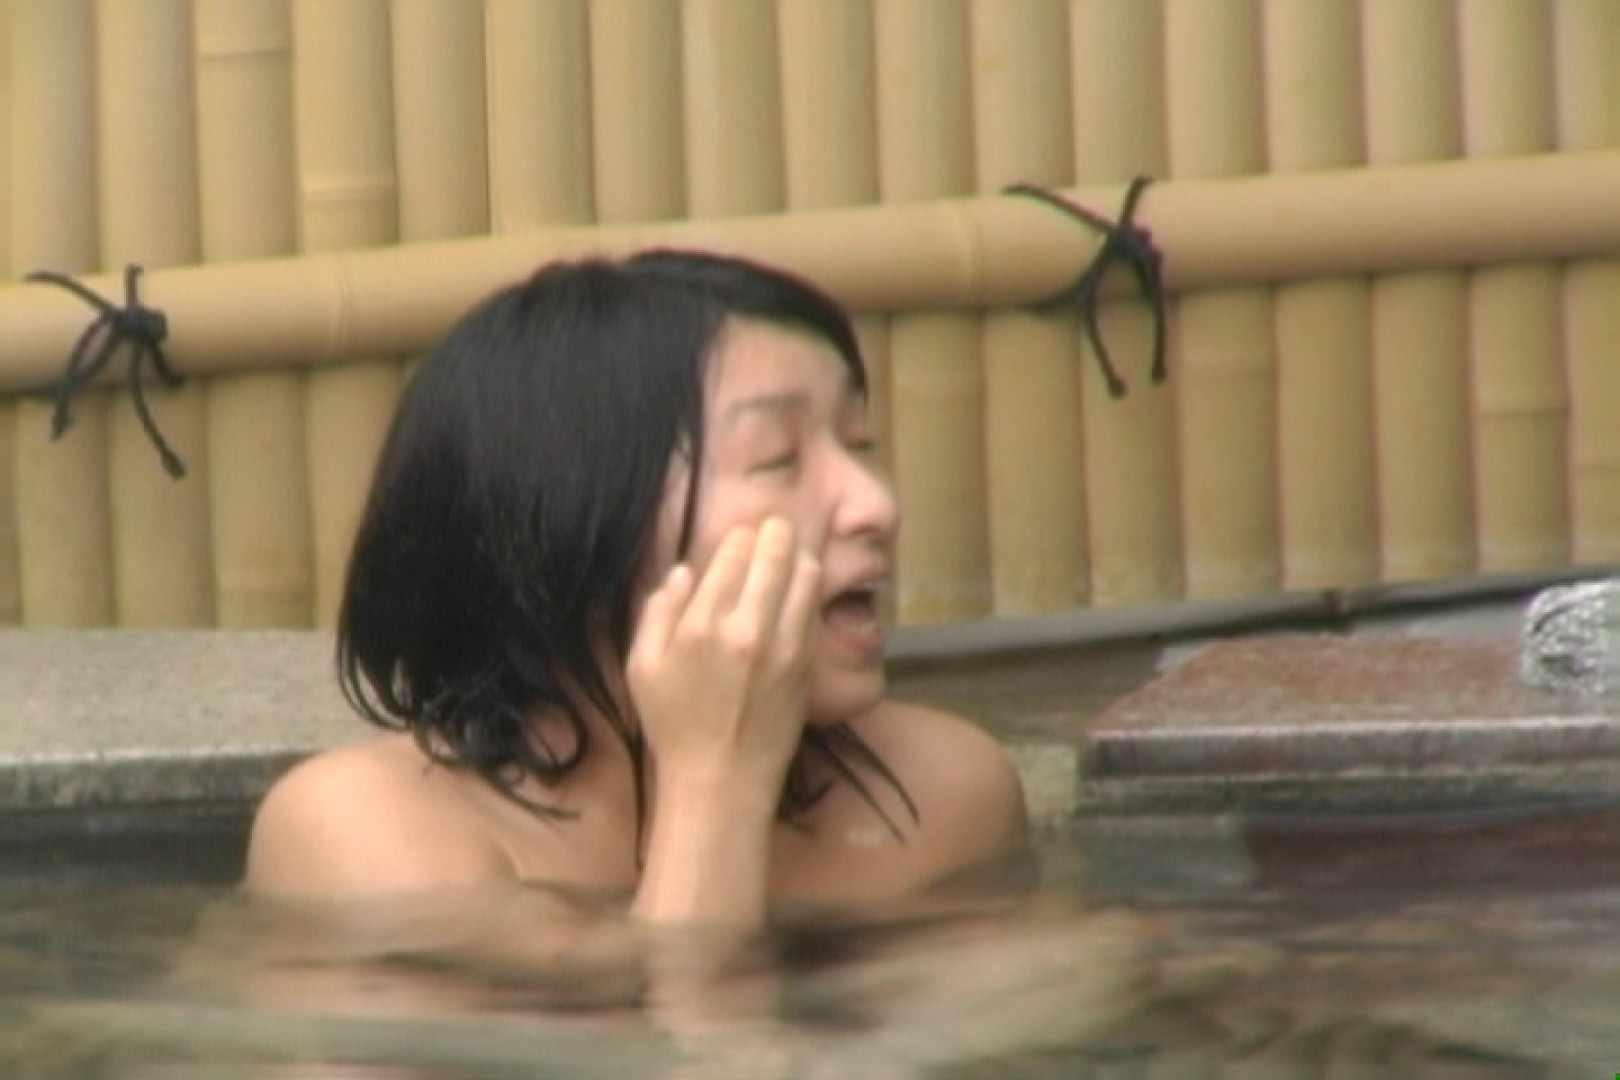 Aquaな露天風呂Vol.618 盗撮映像  104Pix 57